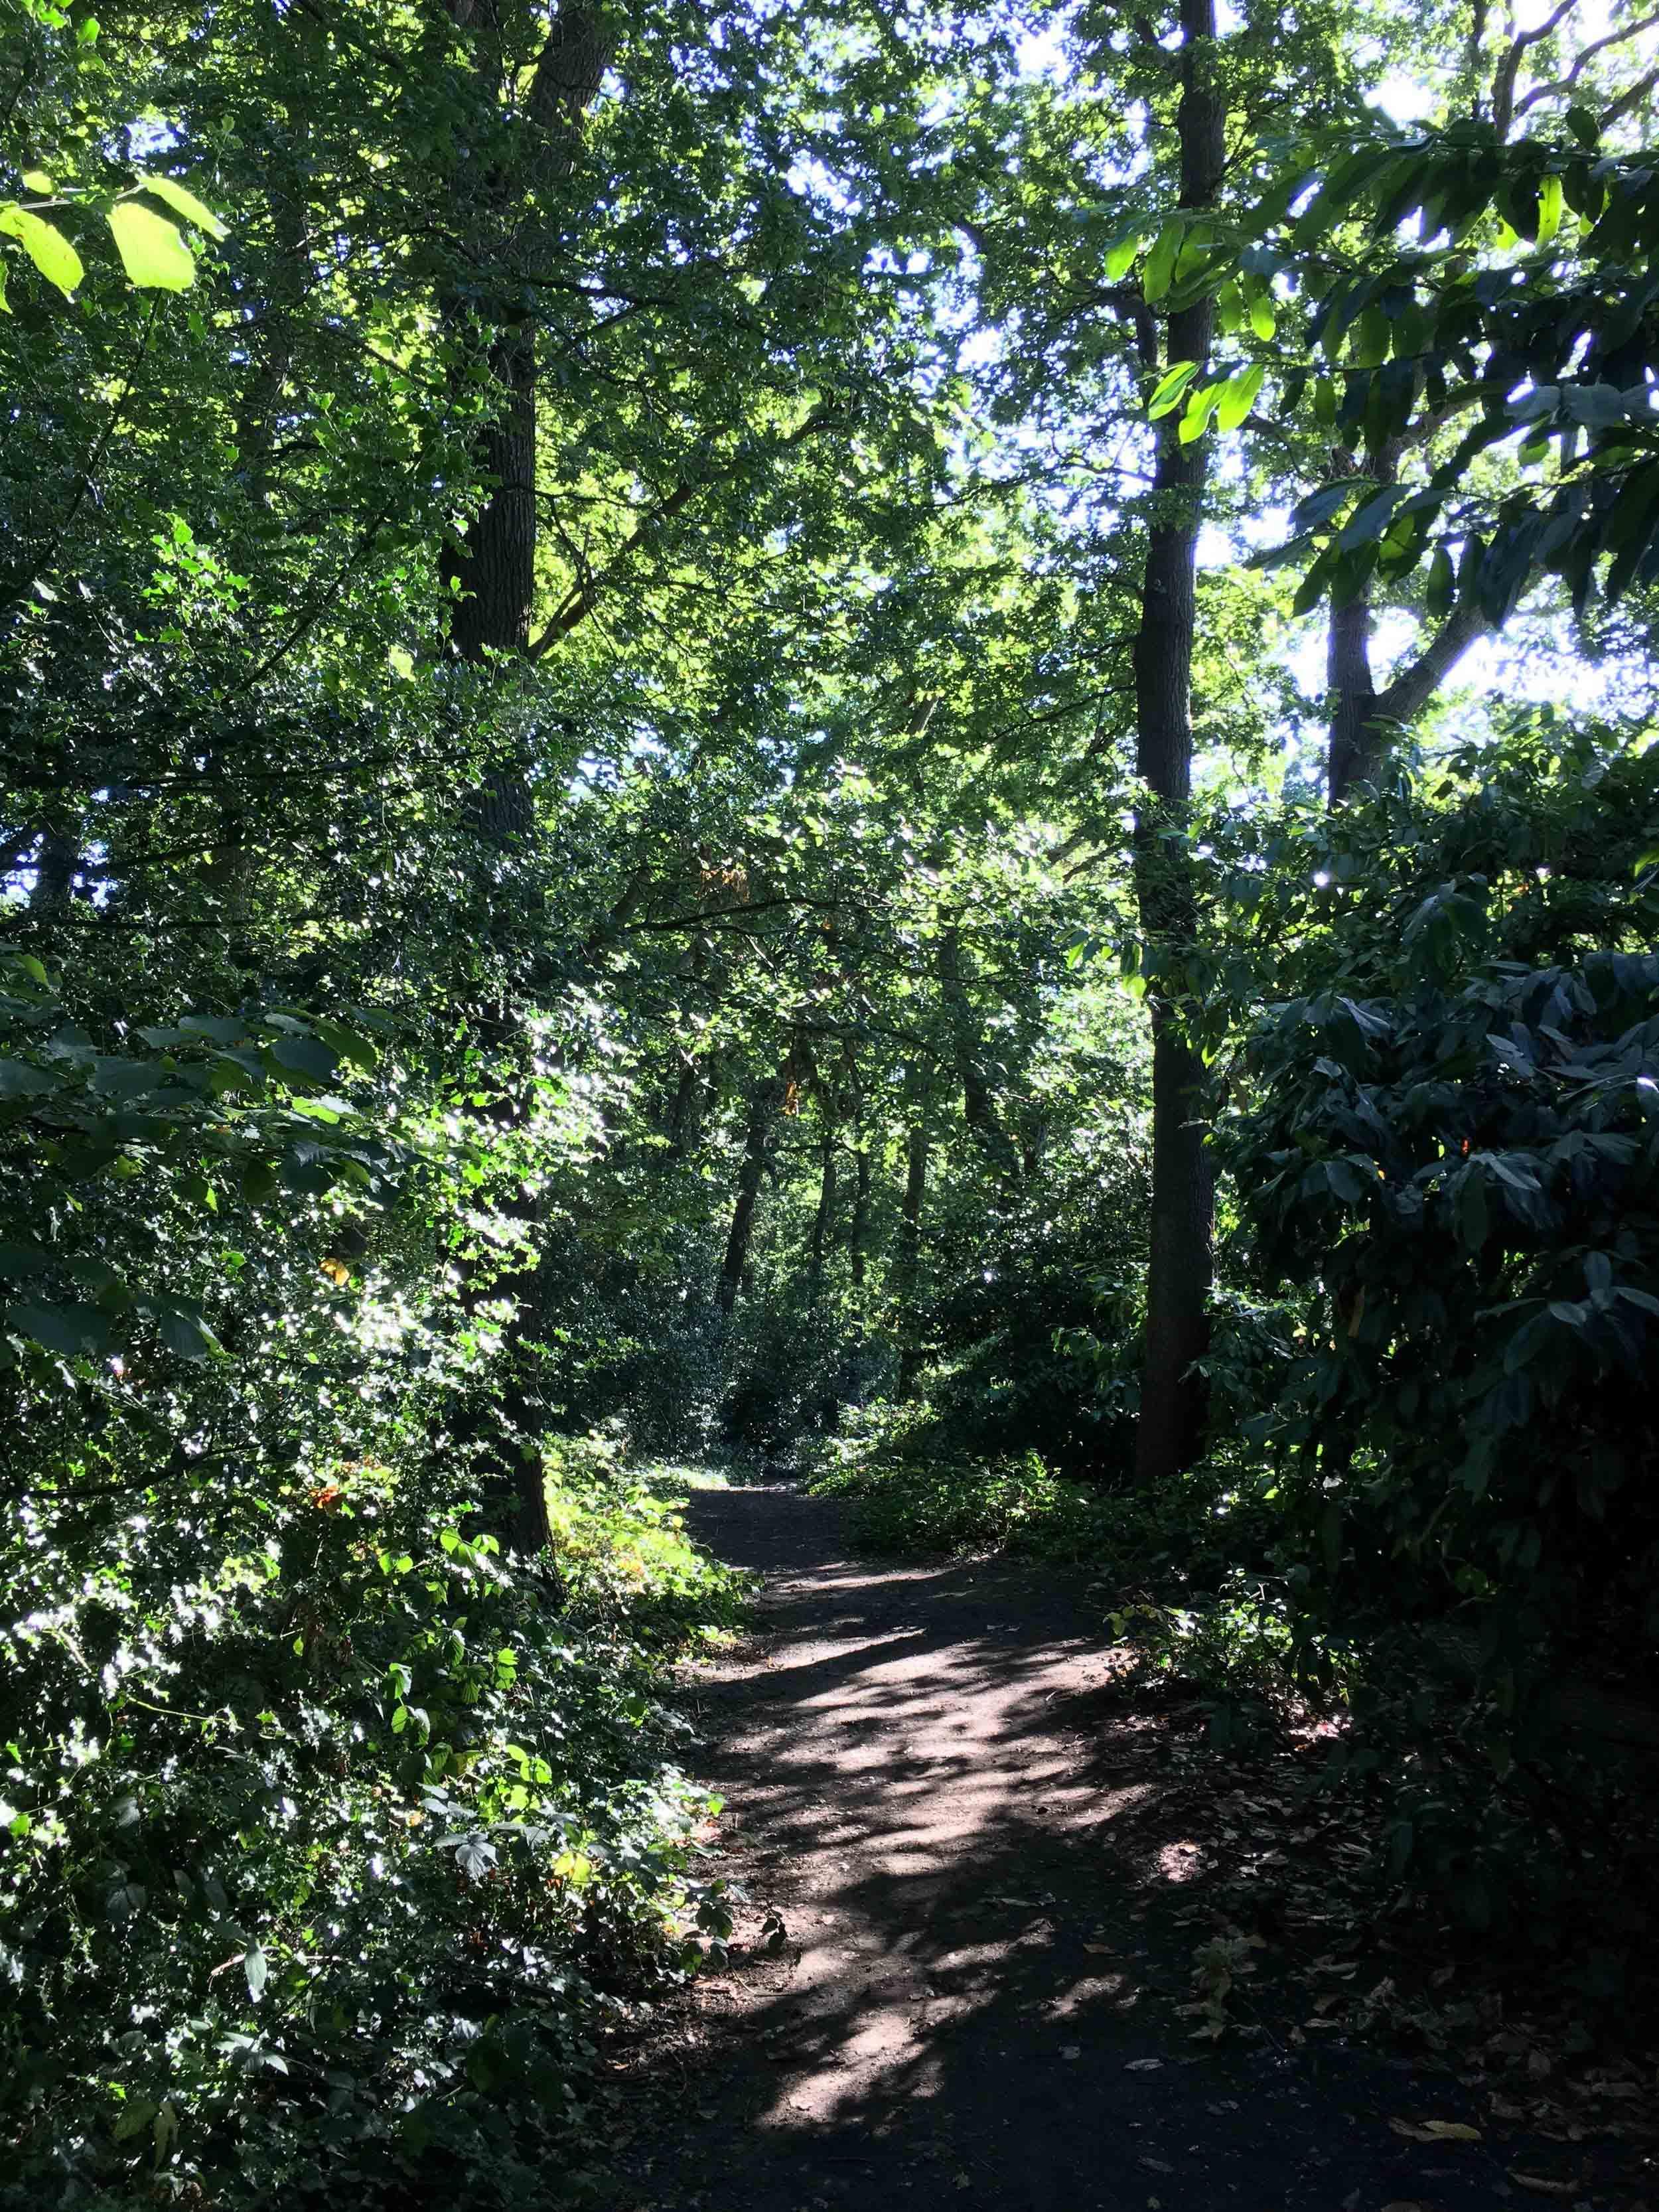 woods-trees-nature-jaunt-gojauntly